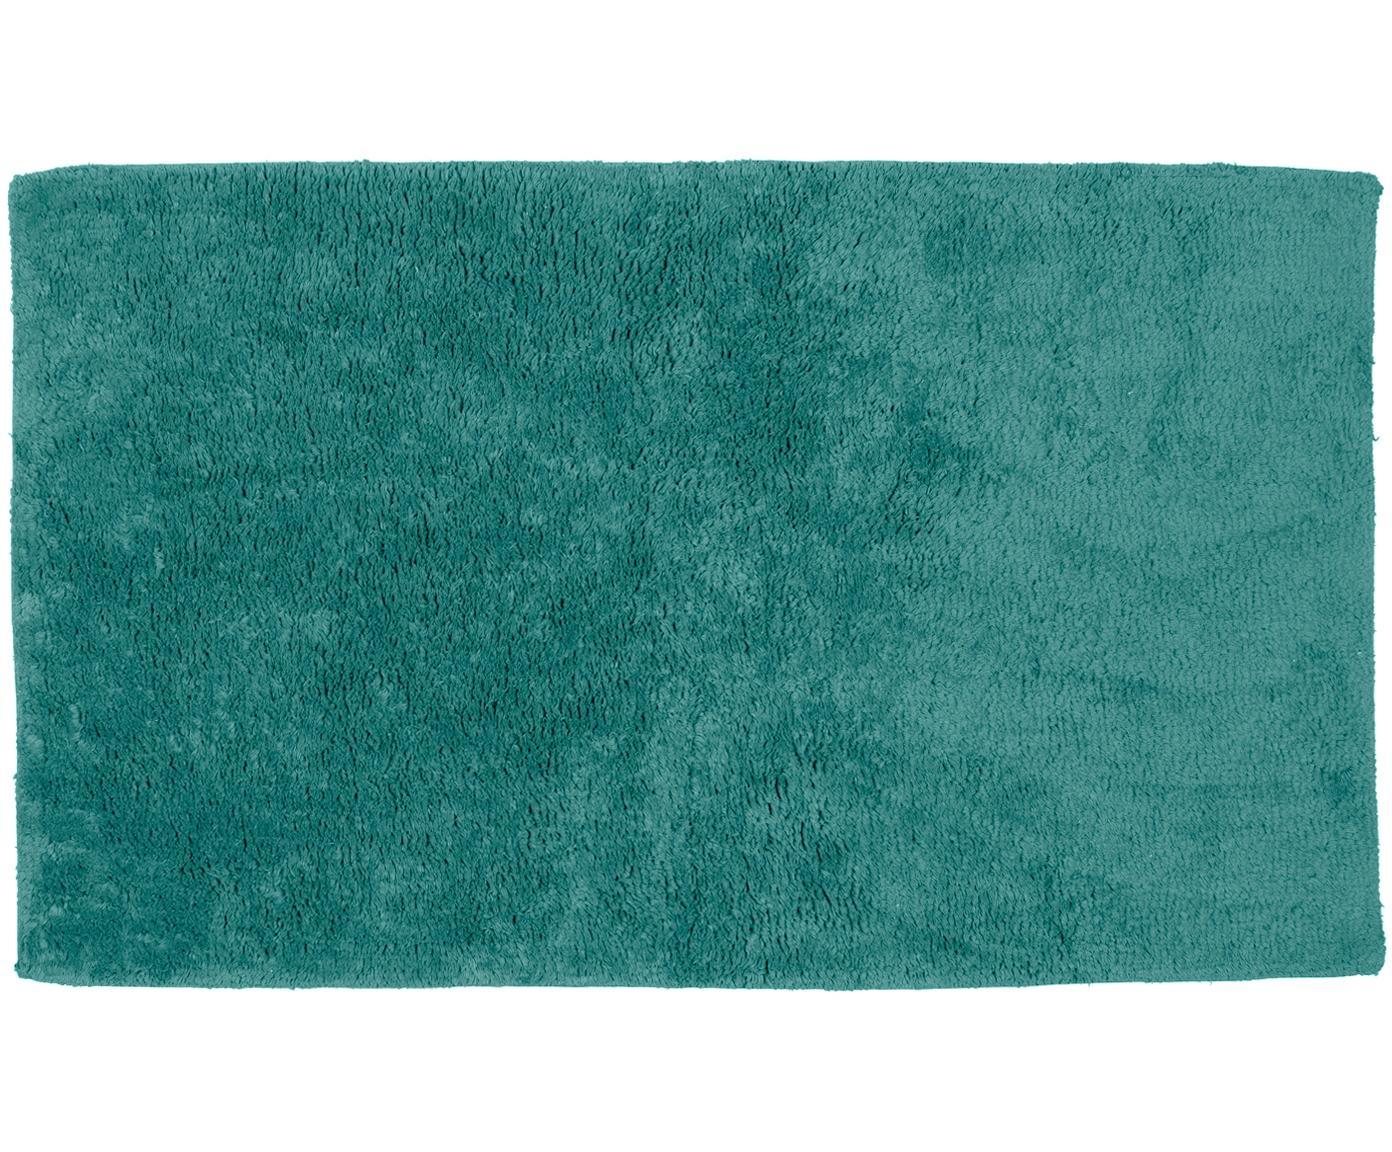 Großer Badvorleger Luna in Türkis, Smaragdgrün, 70 x 120 cm